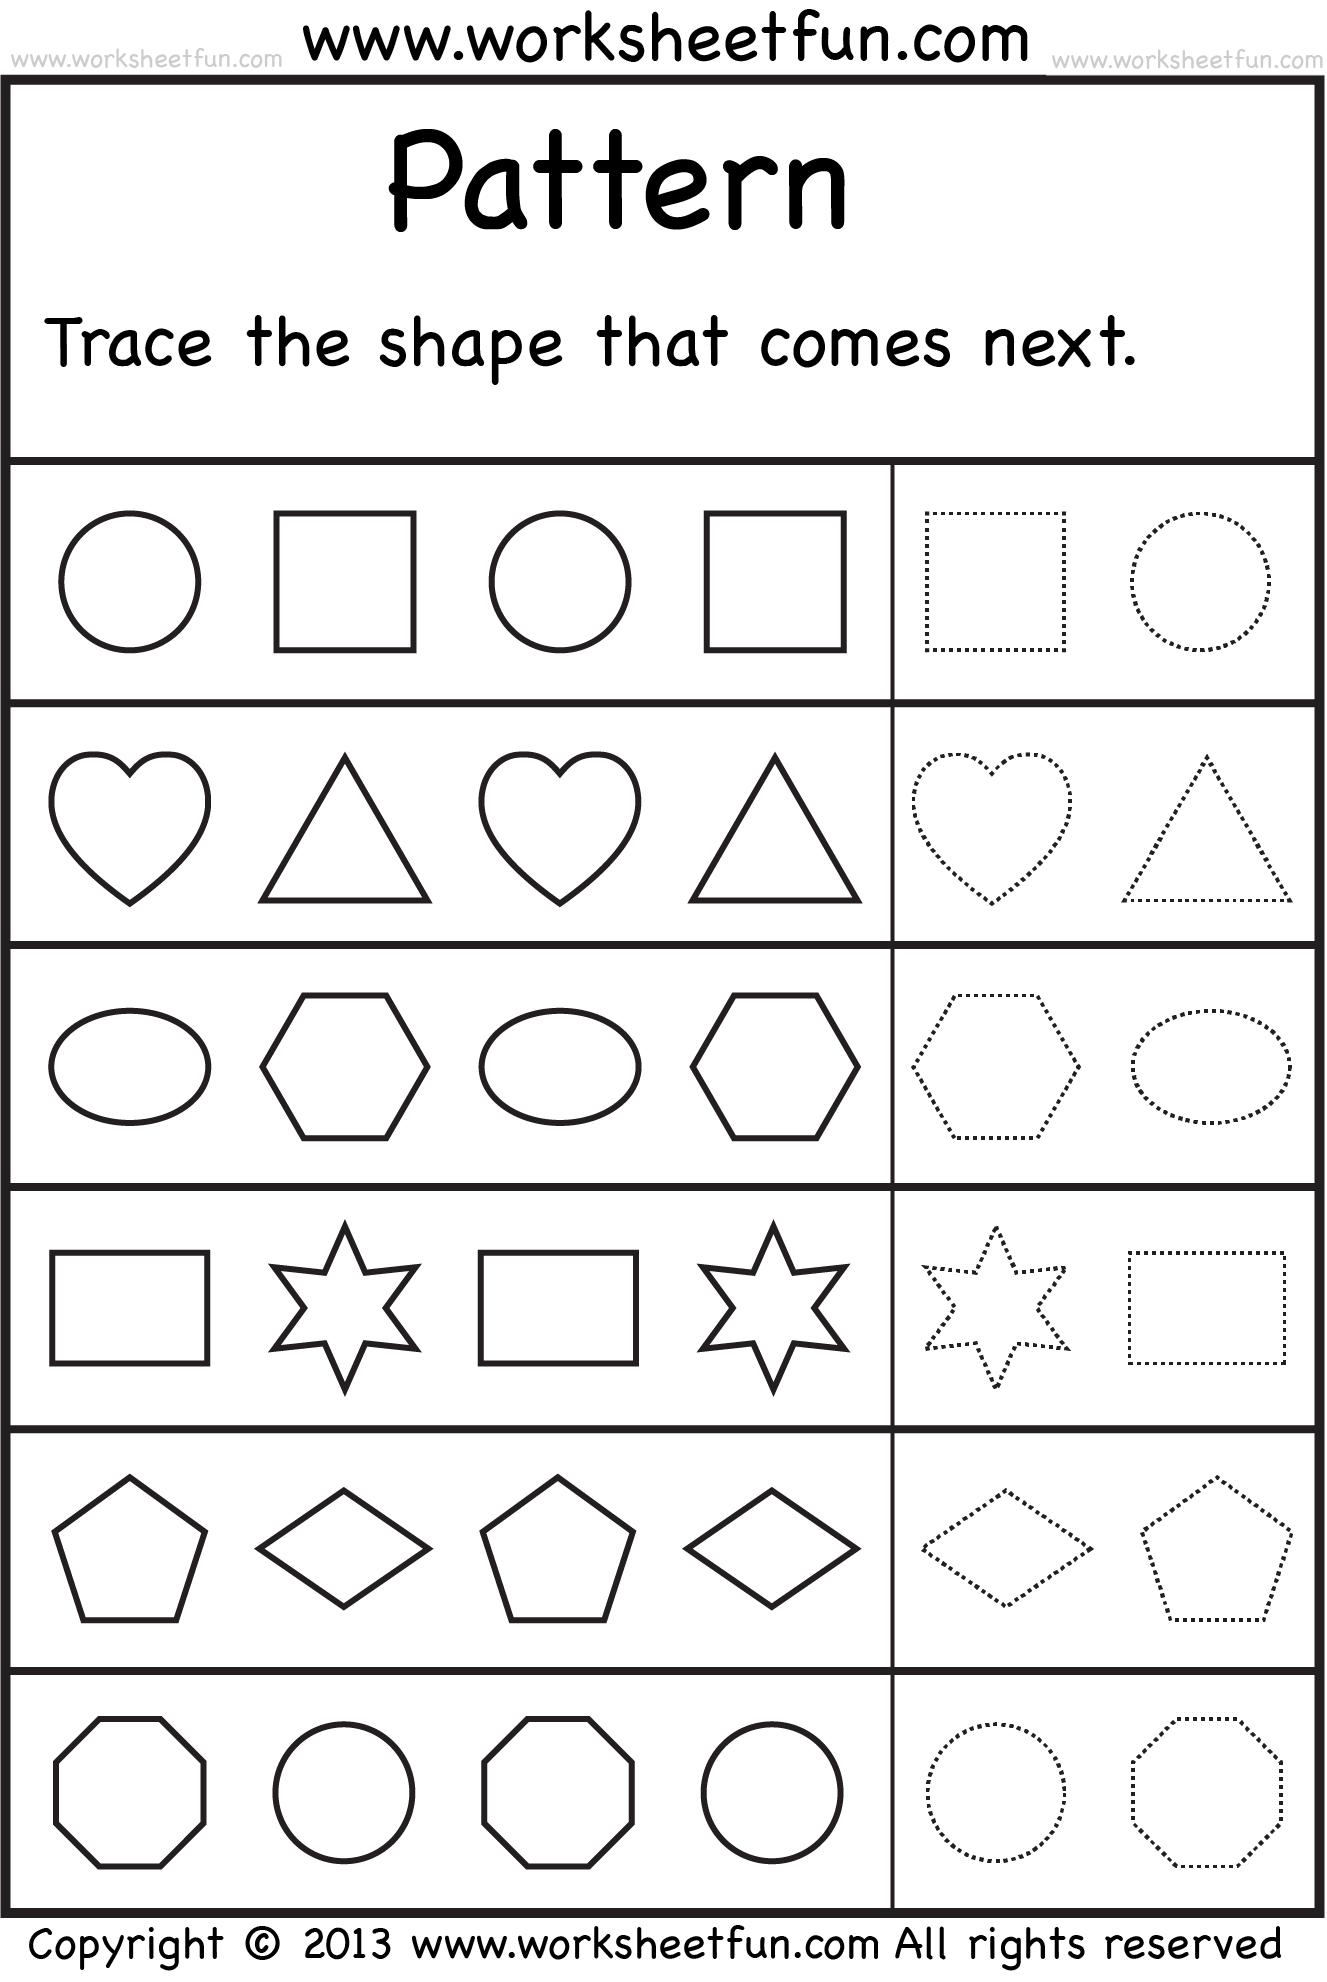 worksheet Preschool Pattern Worksheets thinking skills lu pinterest printable preschool worksheets 8 best images of patterns free shape pattern kindergarten patter